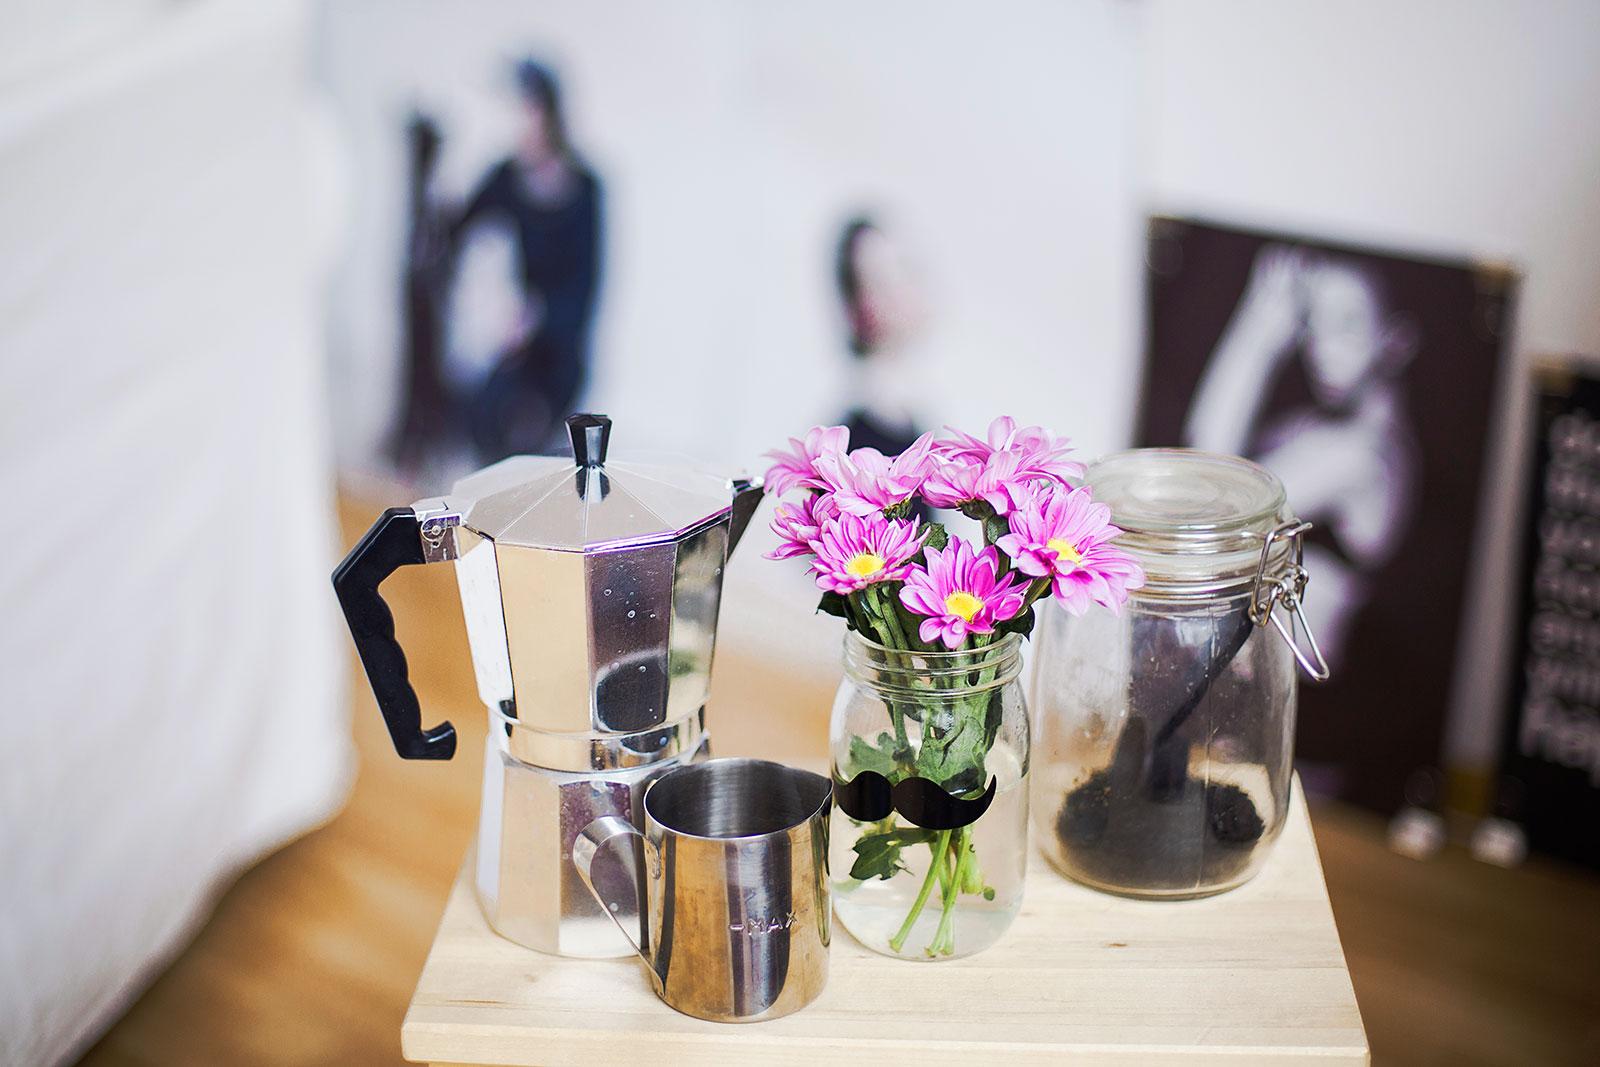 kawa, latte, kawa latte, jak zrobić kawę, kawiarka, makinetka